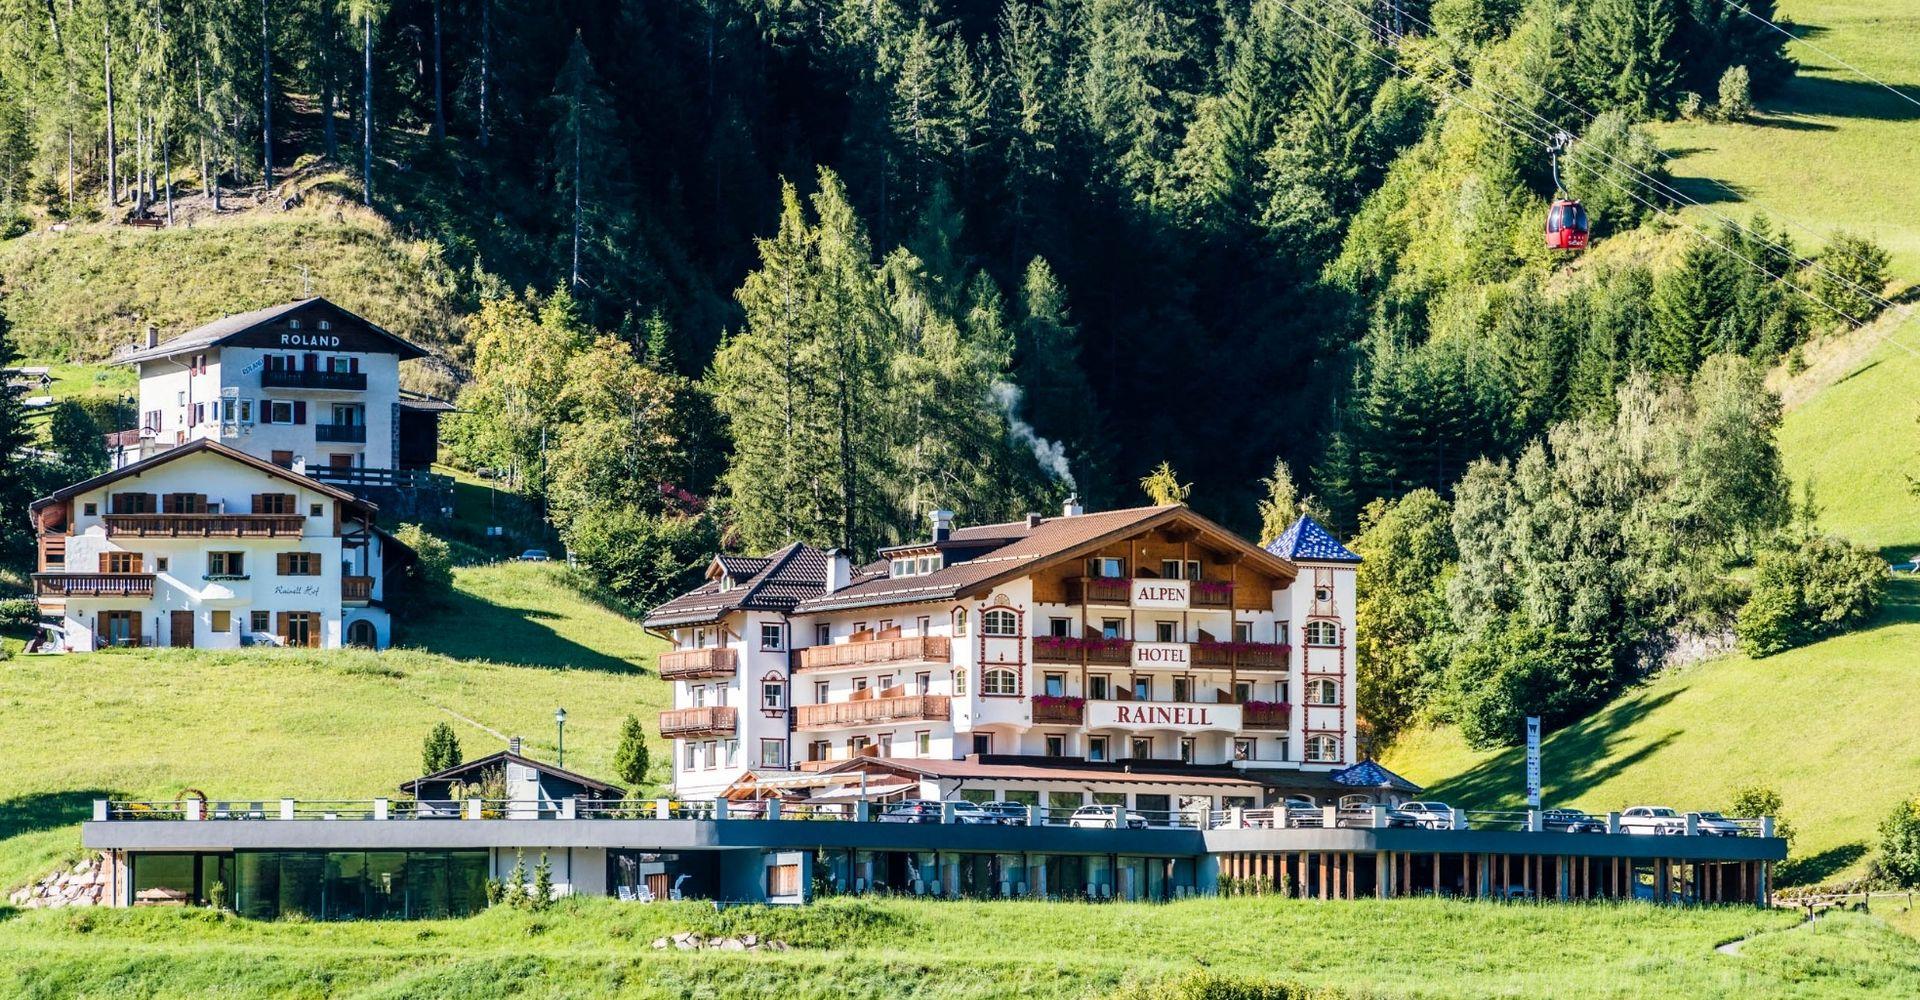 Hotel Rainell